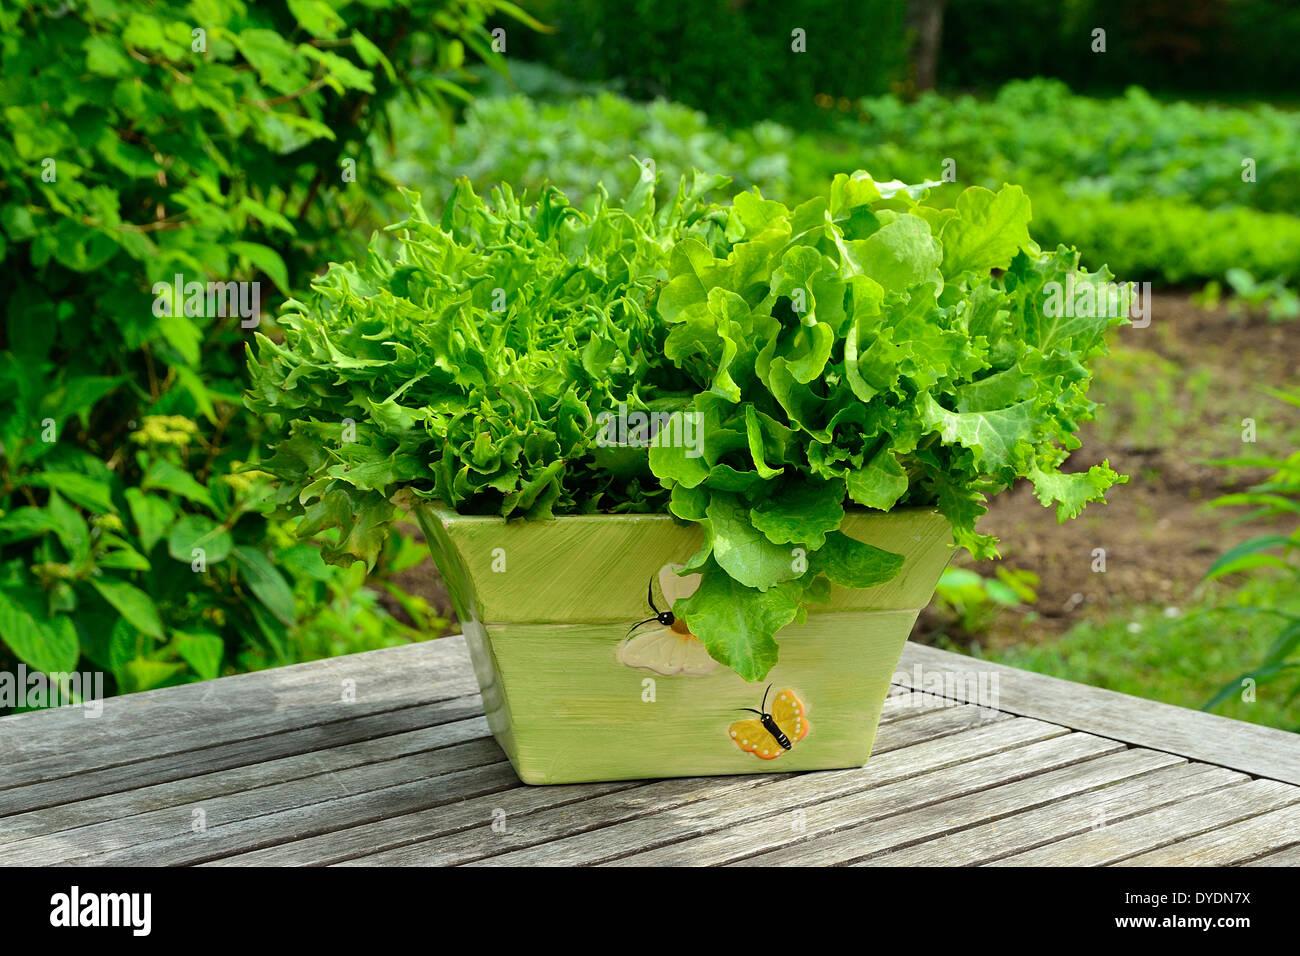 Different Varieties Of Lettuces Batavia Leaf Of Oak